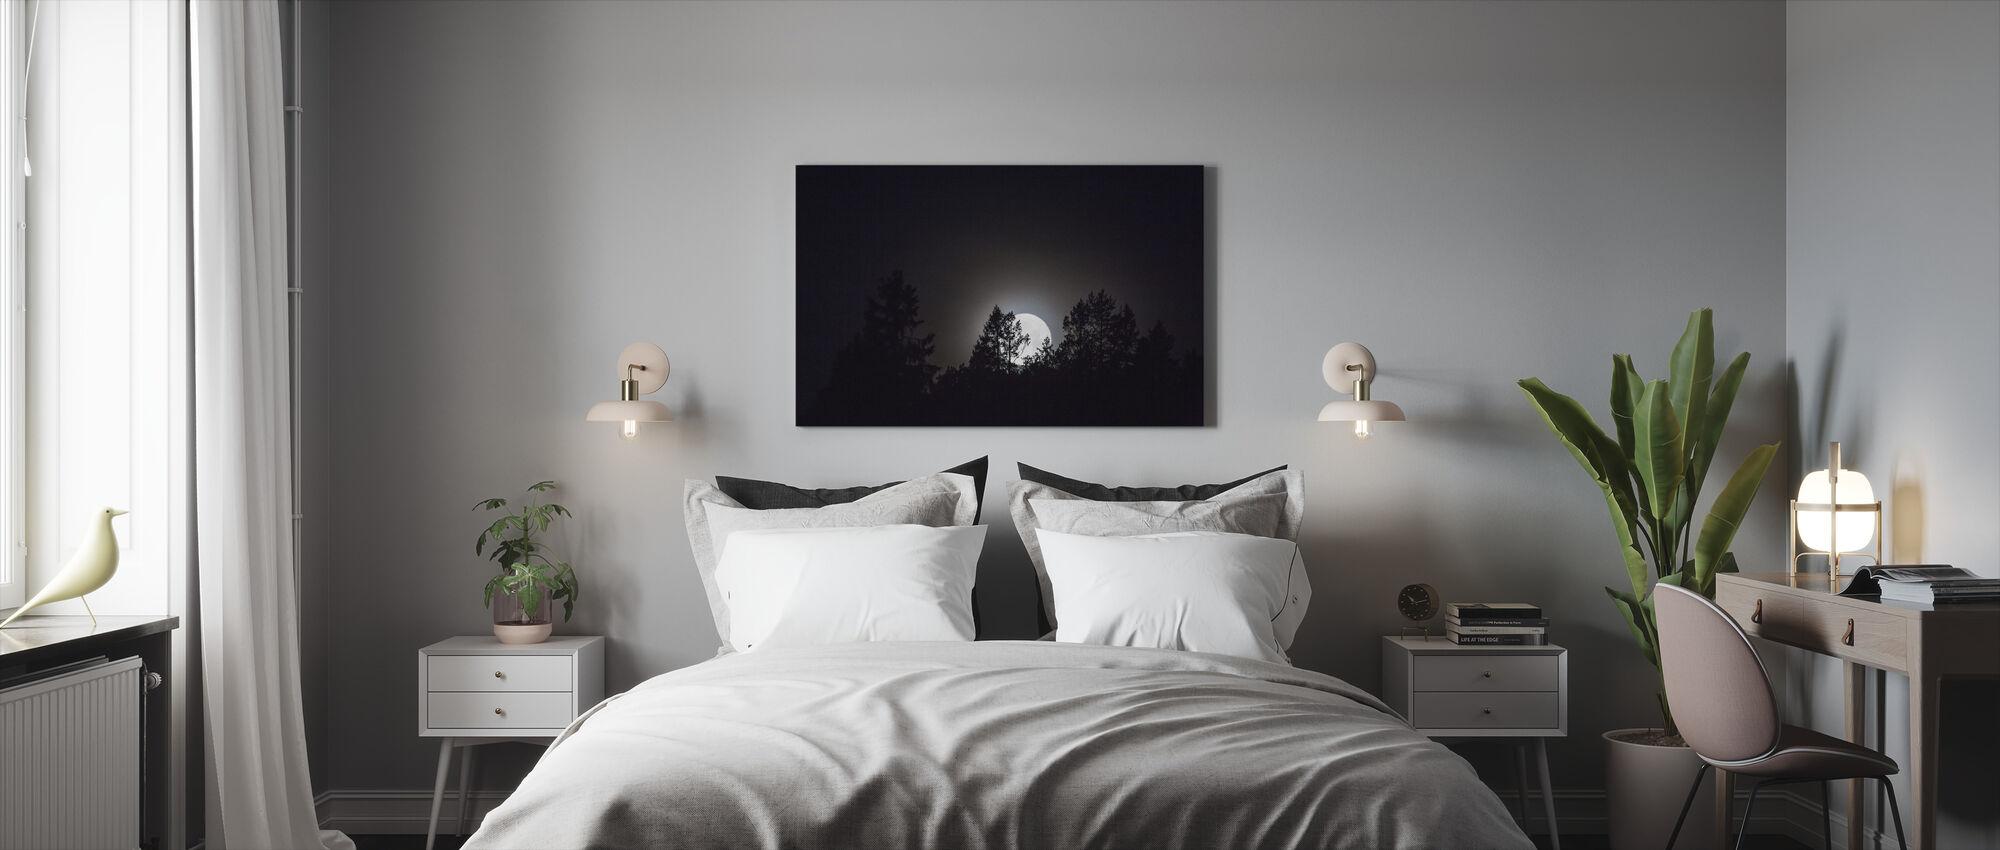 Moonlight over Medelpad, Sweden, Europe - Canvas print - Bedroom